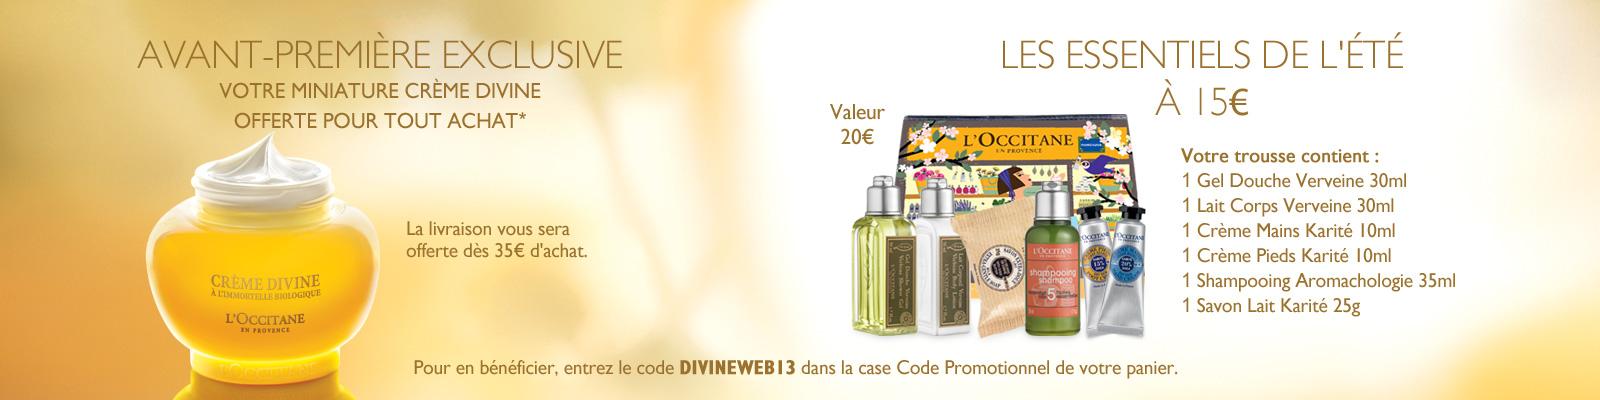 Offre Divine Marie-Claire - L'Occitane France